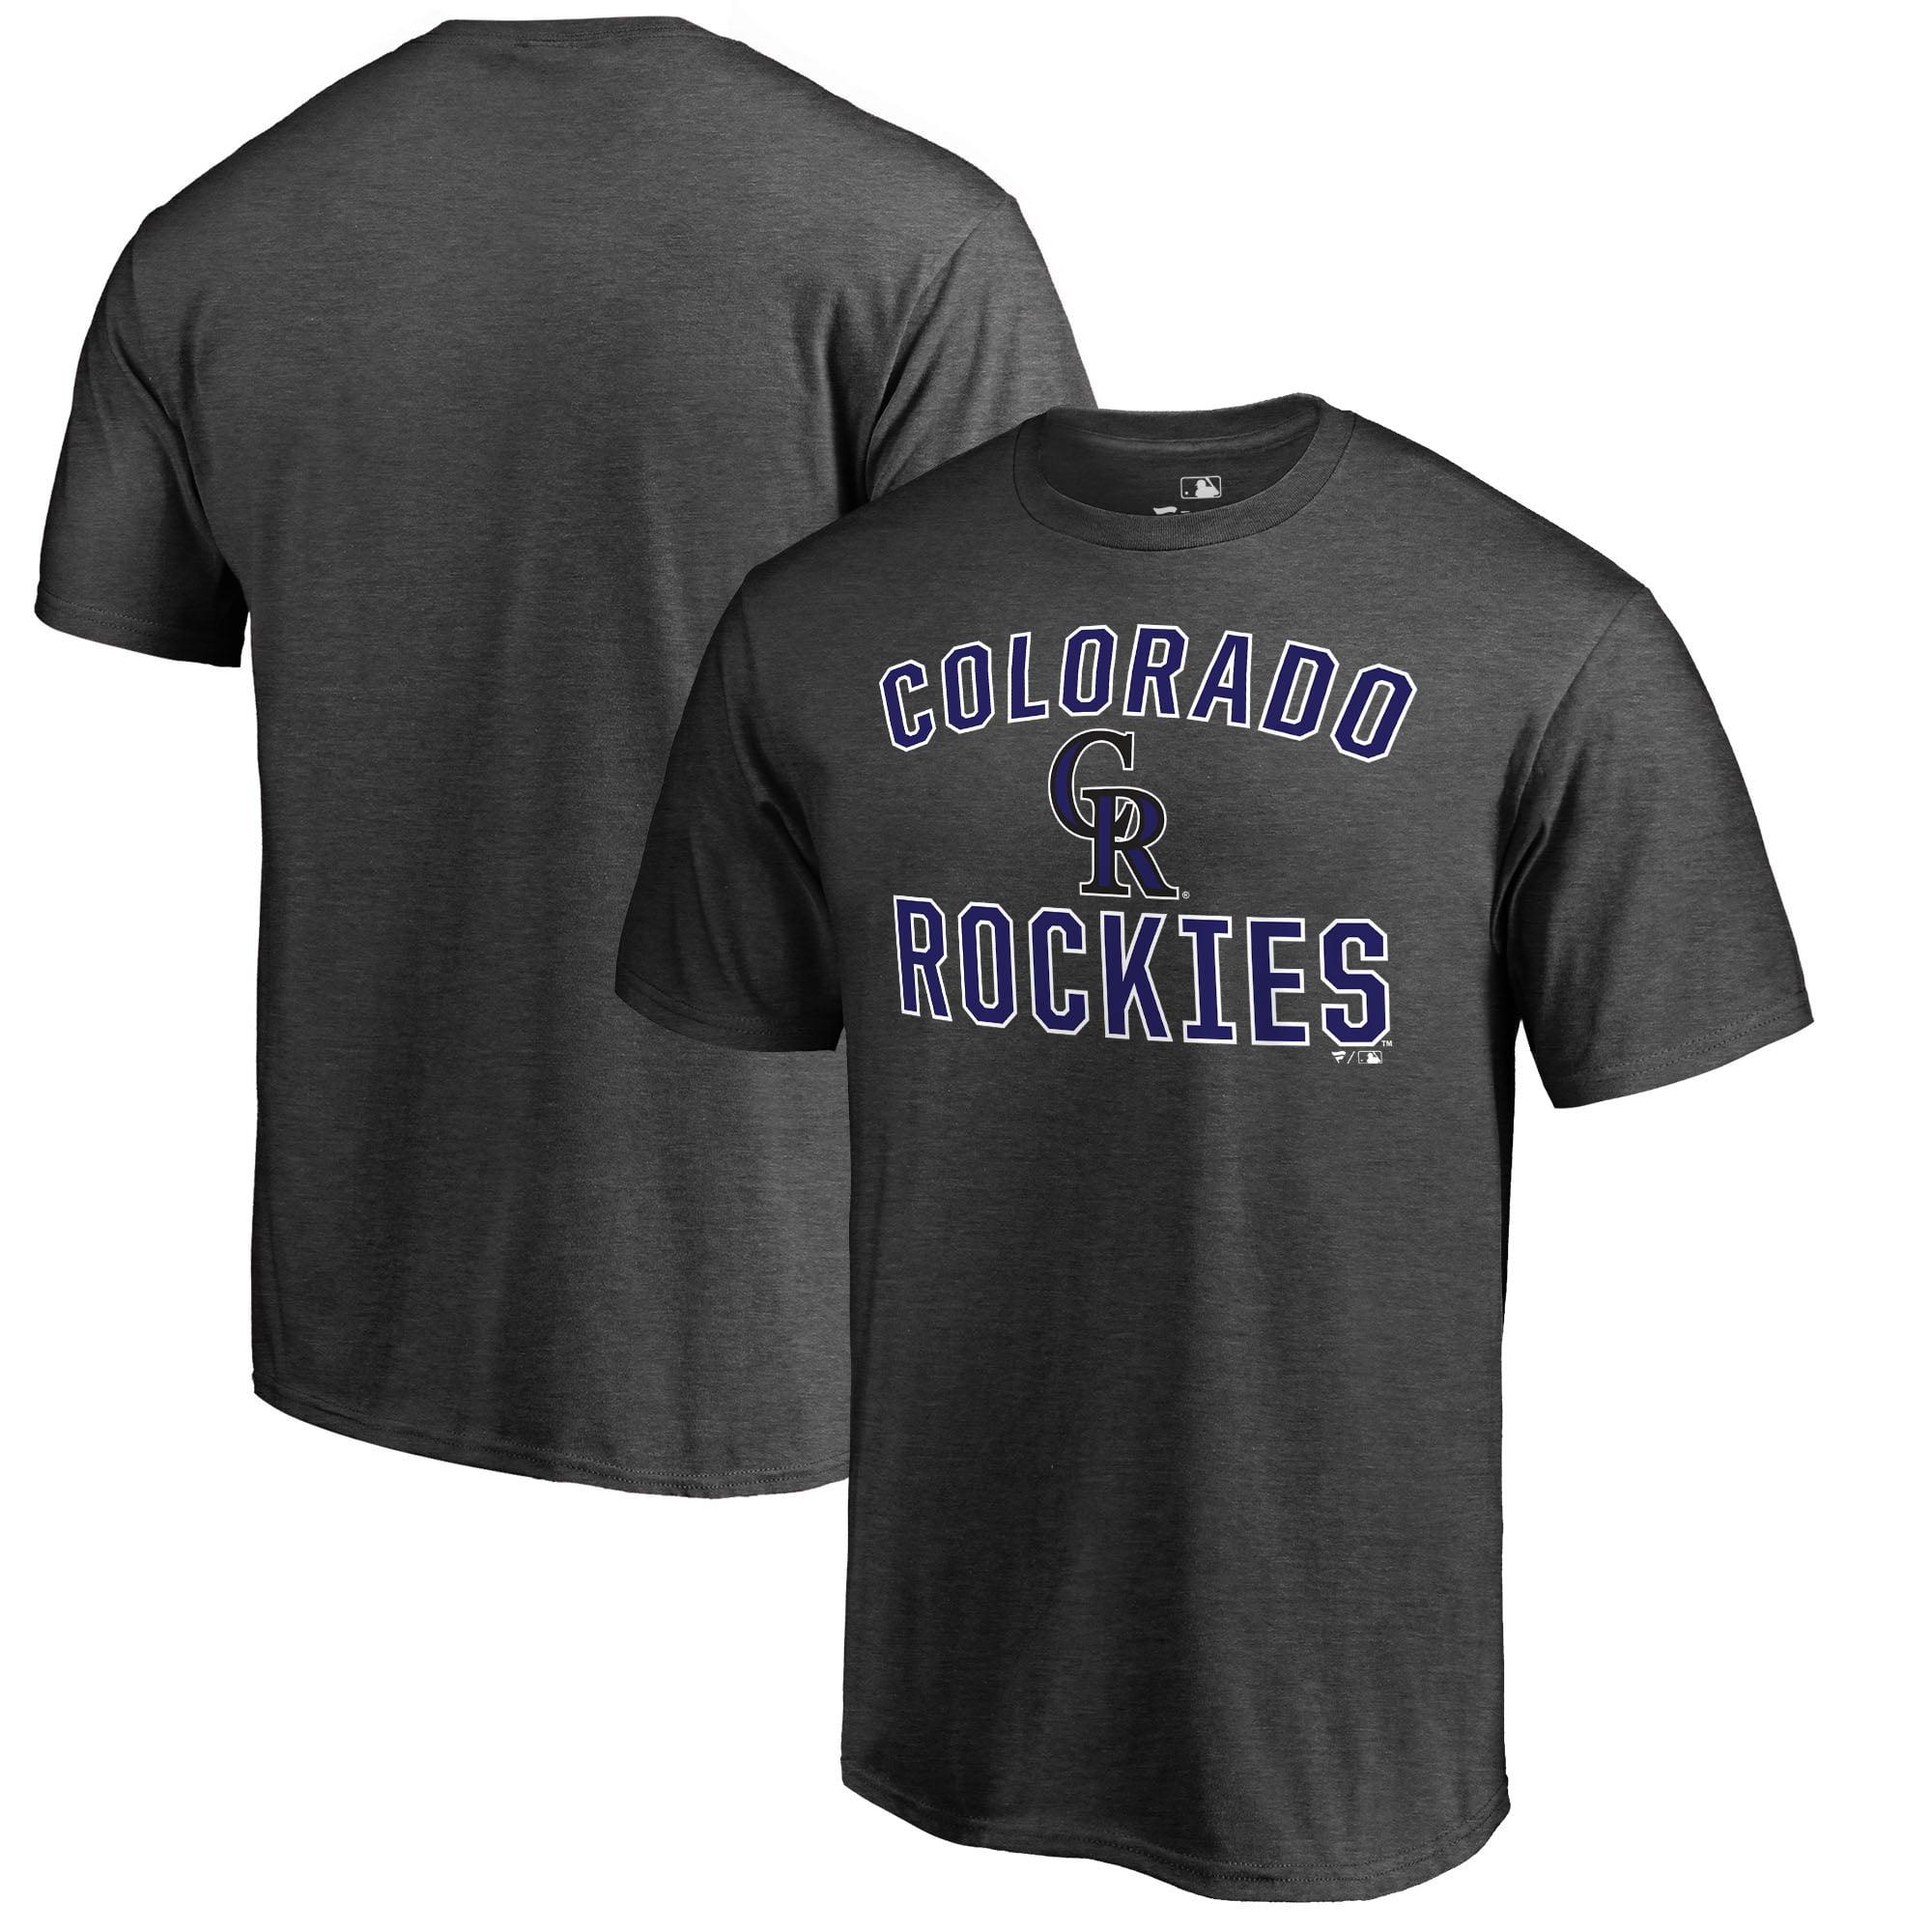 Colorado Rockies Fanatics Branded Core Basics Victory Arch T-Shirt - Heathered Gray